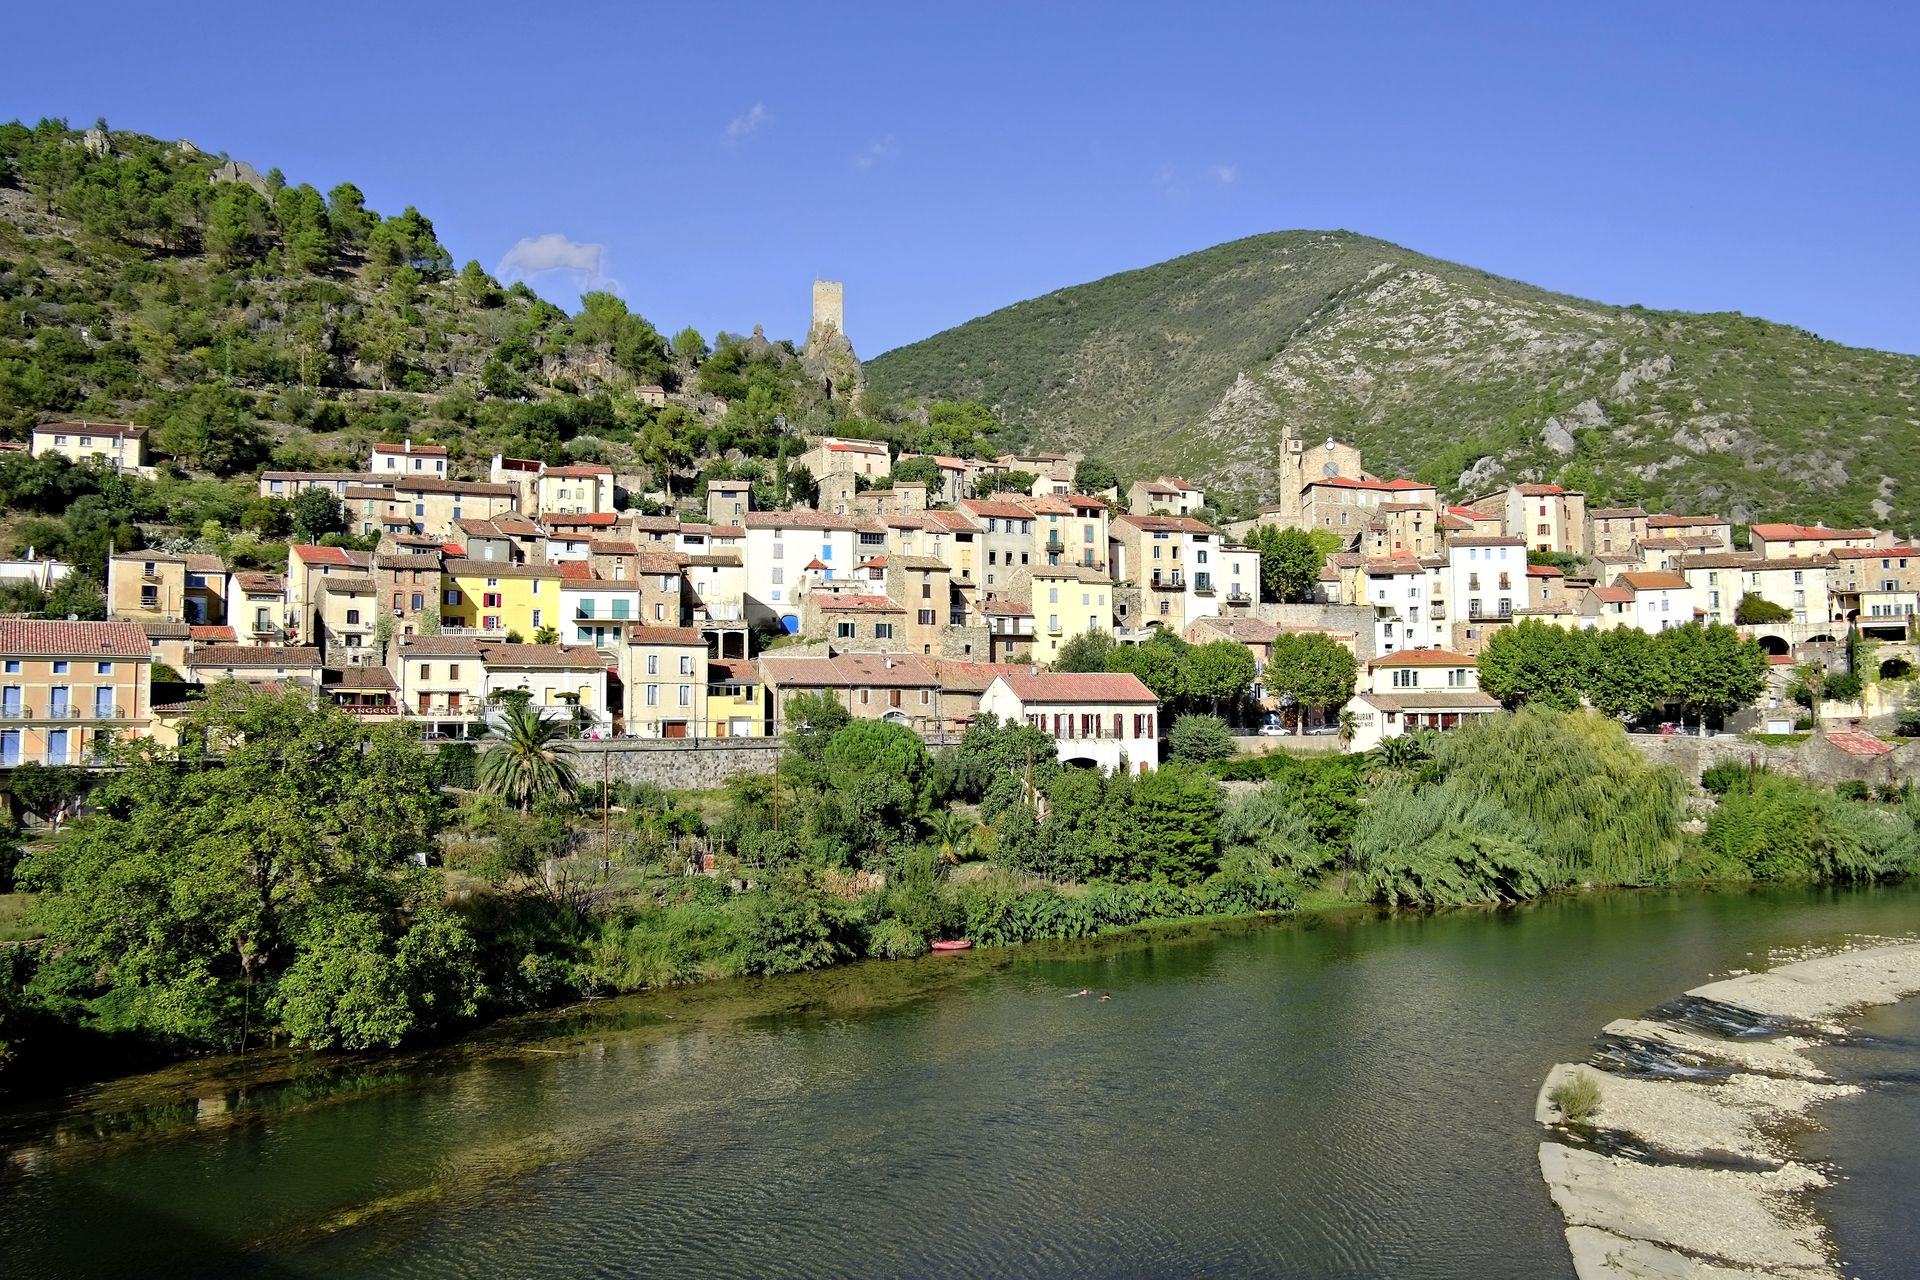 Village de Roquebrun en Haut-Languedoc